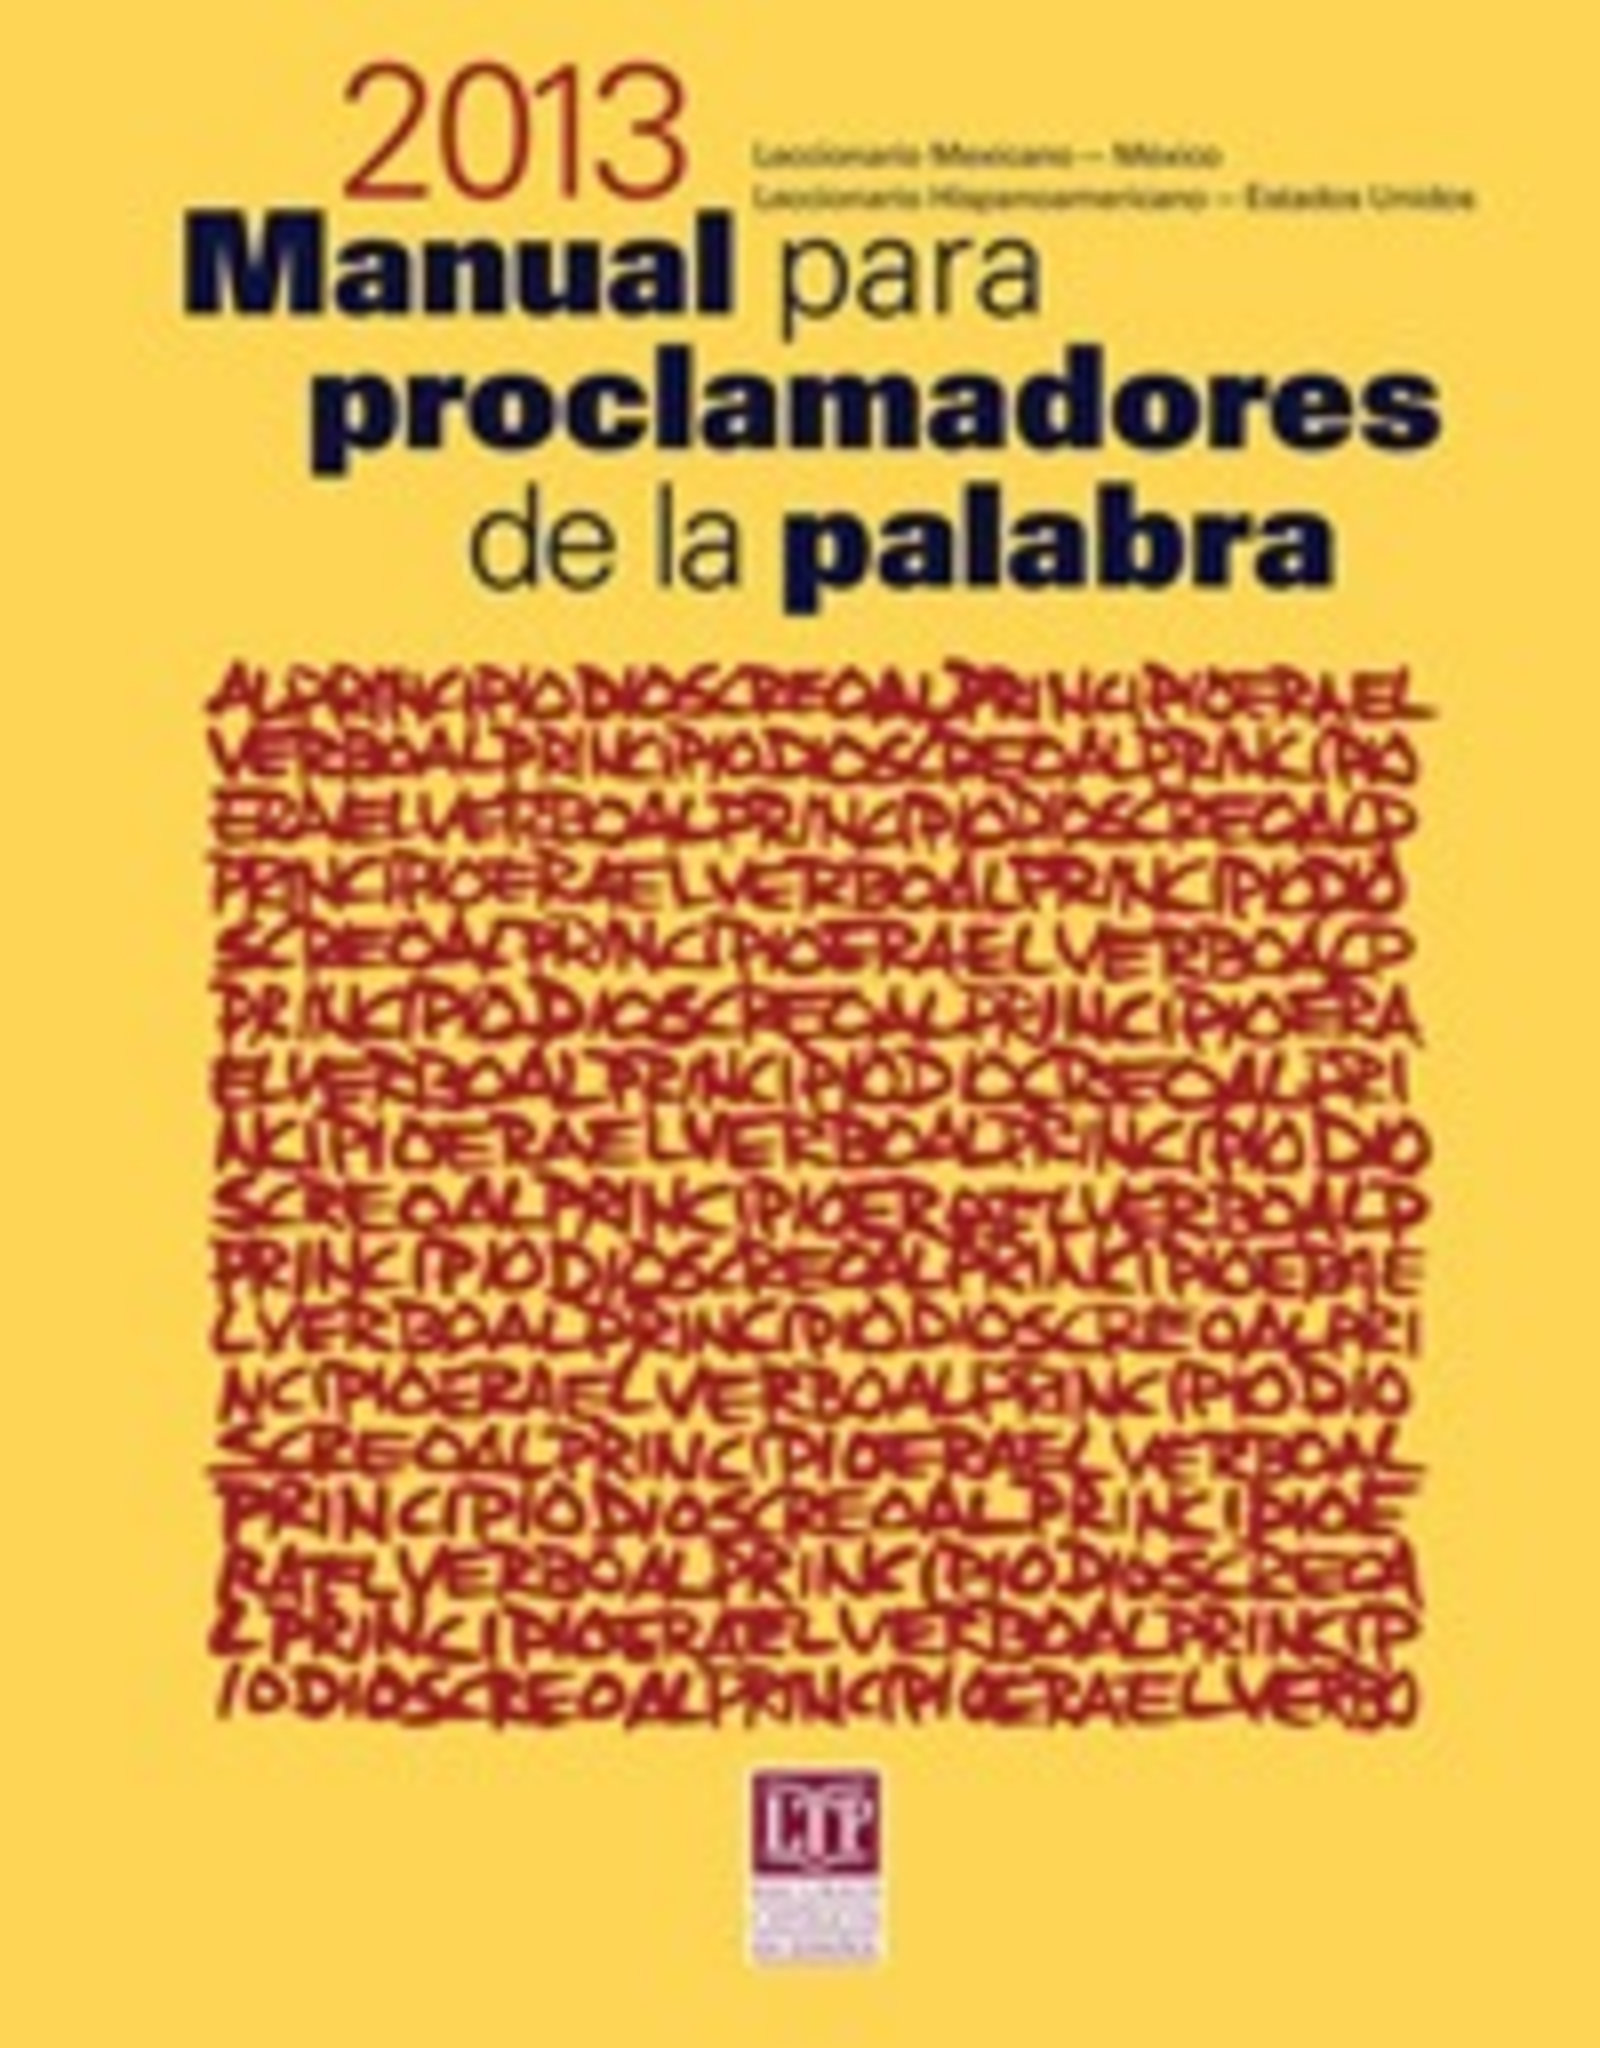 Liturgical Training Press Manual para proclamadores de la palabra 2013, Santiago Cort̩s-Sj̦berg